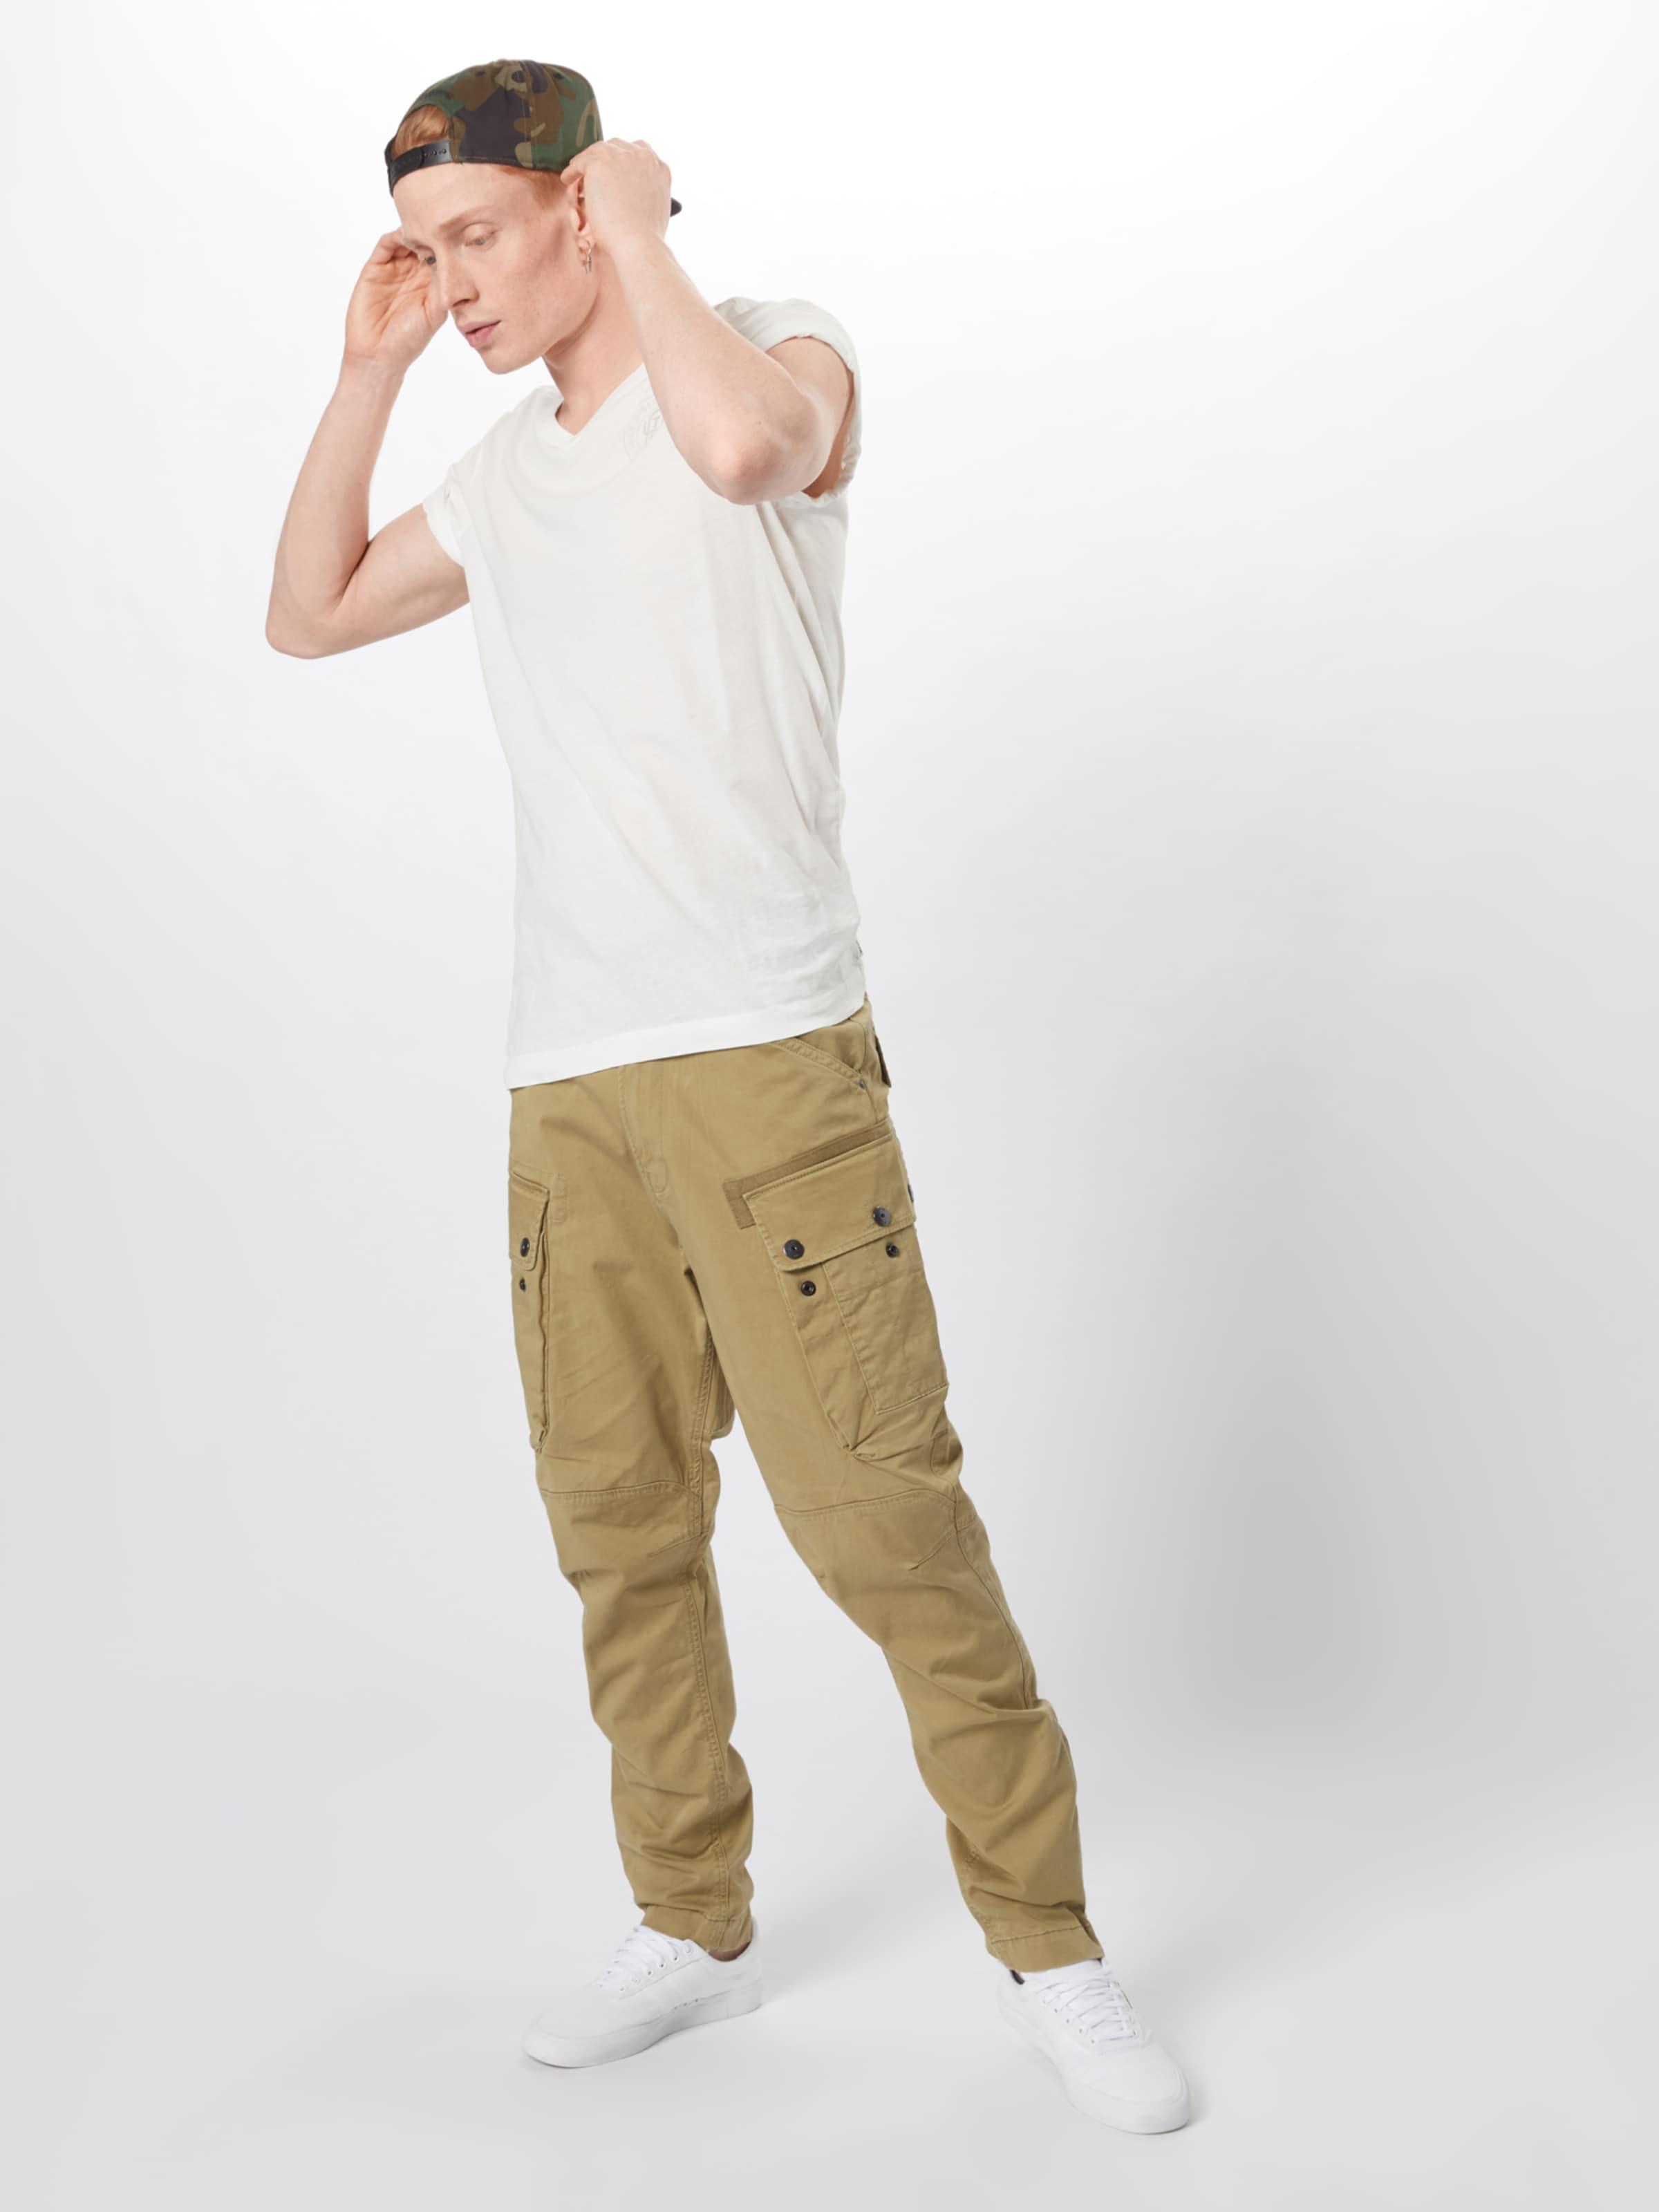 Pantalon star Cargo 'dustor' Raw En Kaki G jcLAq35R4